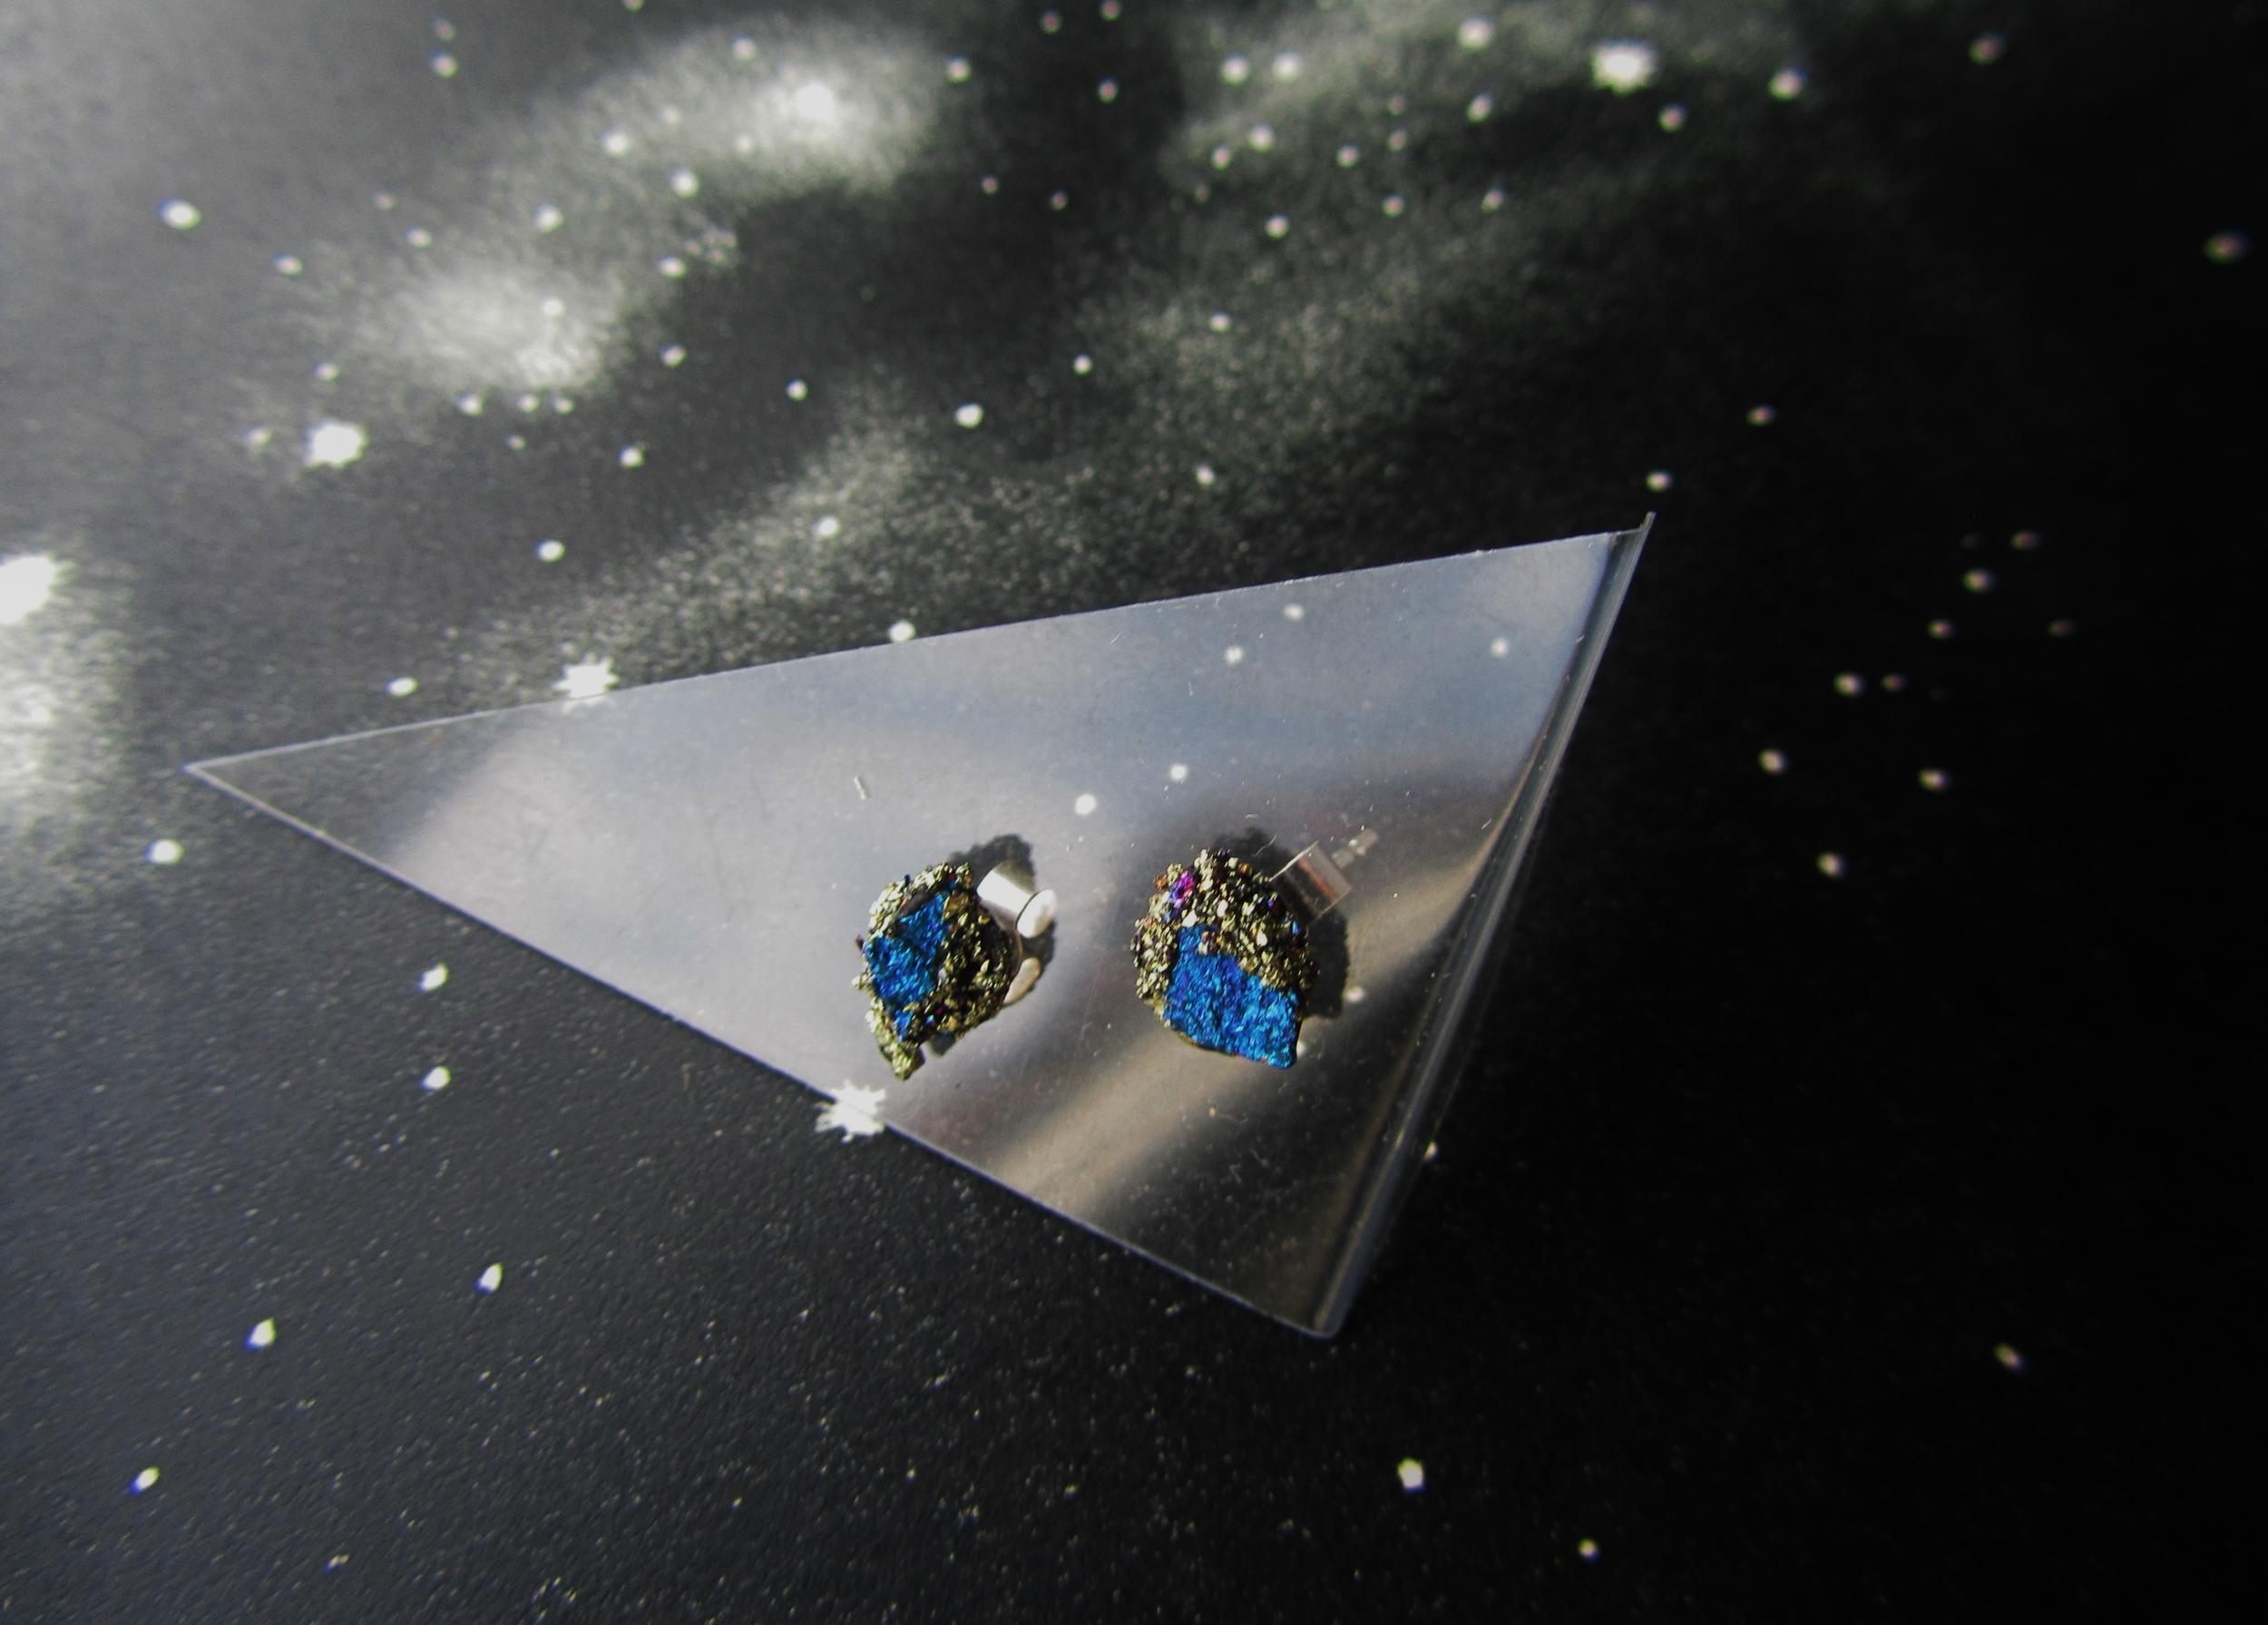 Blue peacock ore stu earrings jade mellor.JPG